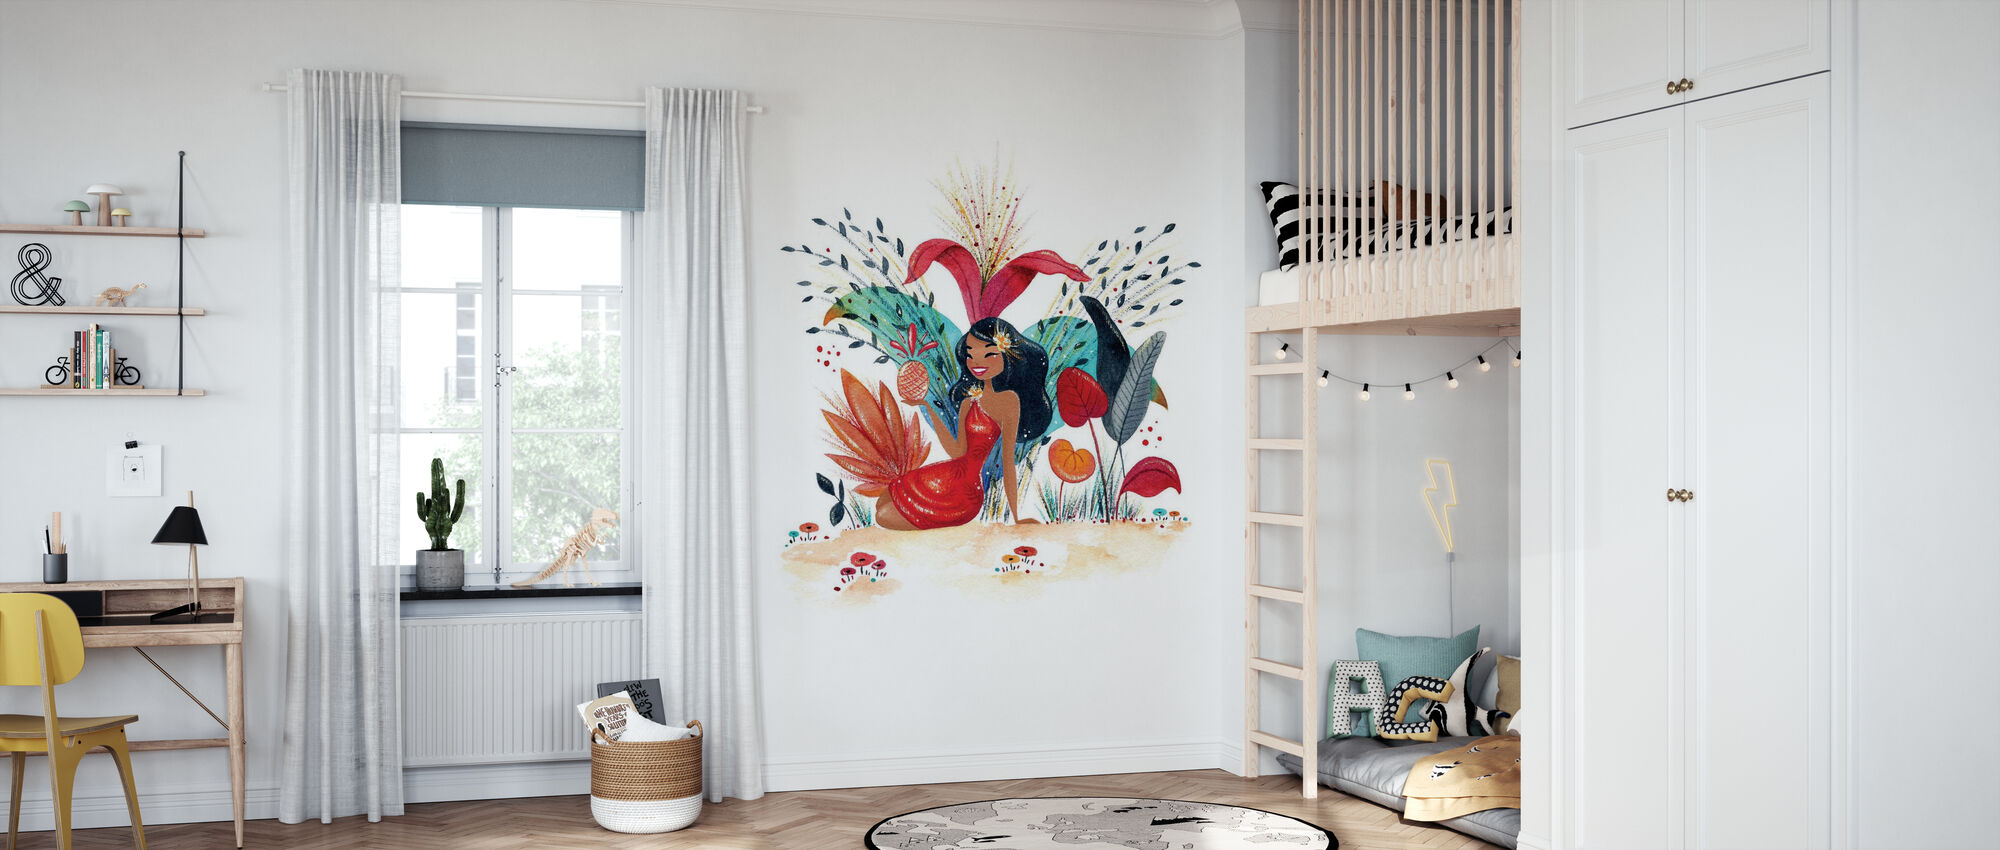 Fantastic Tropic IV - Wallpaper - Kids Room